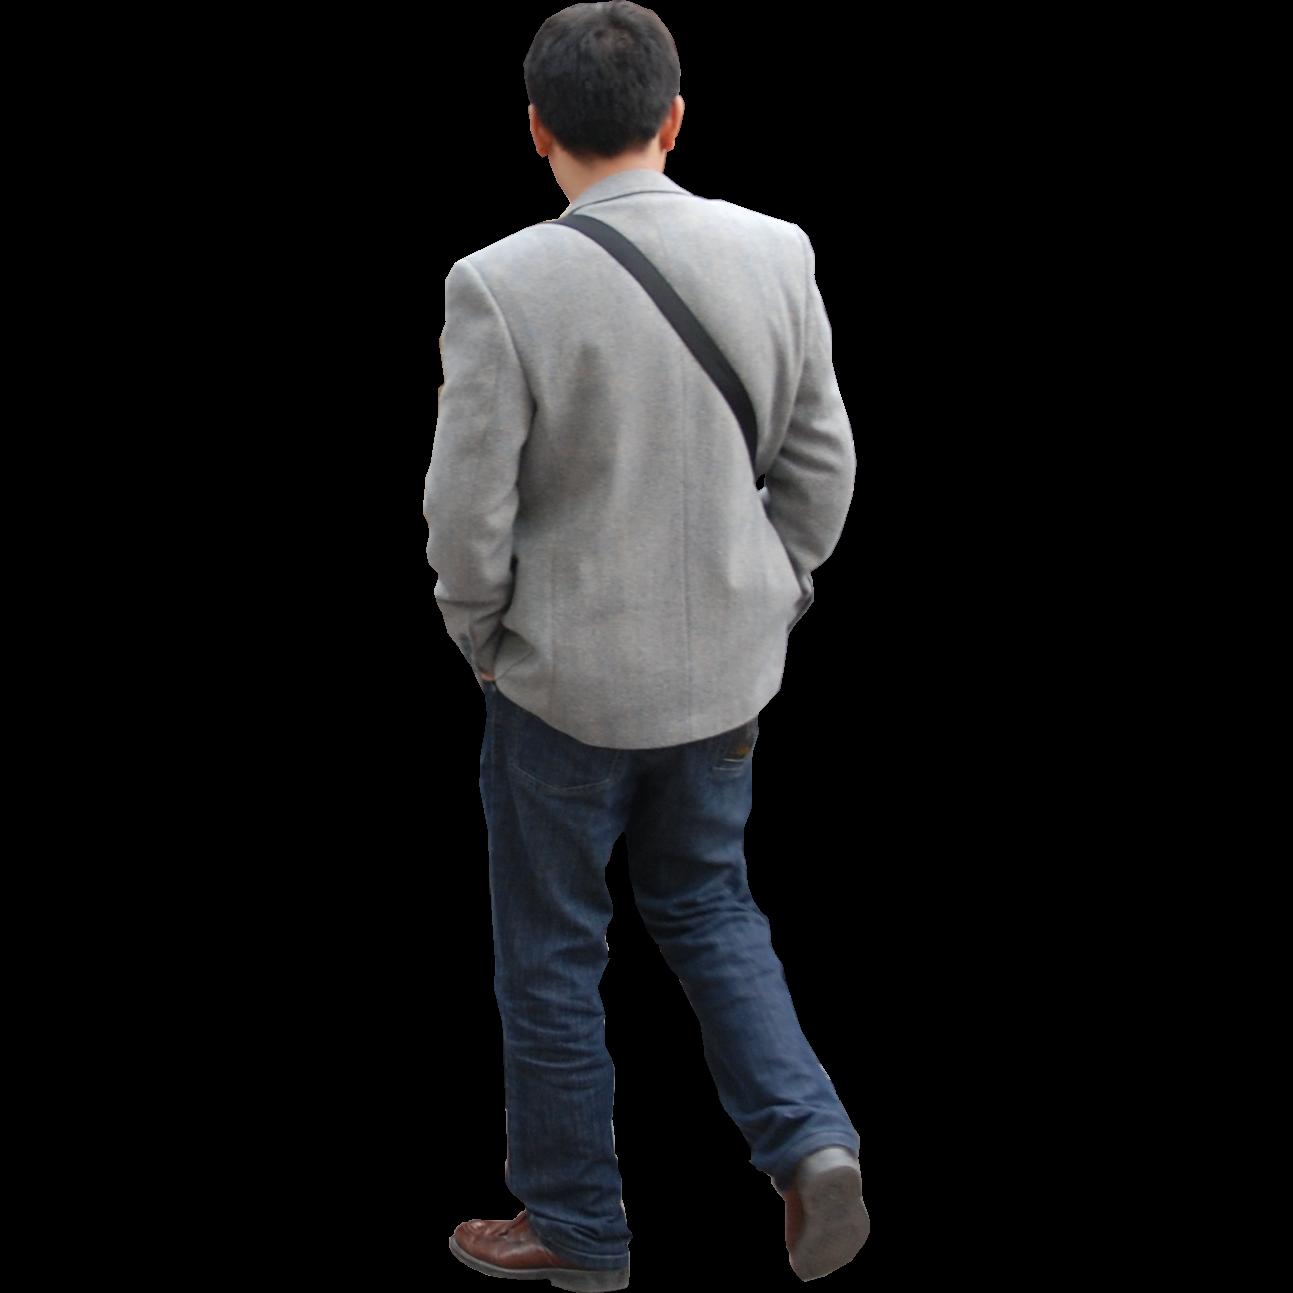 free cutout photo of a man walking away.